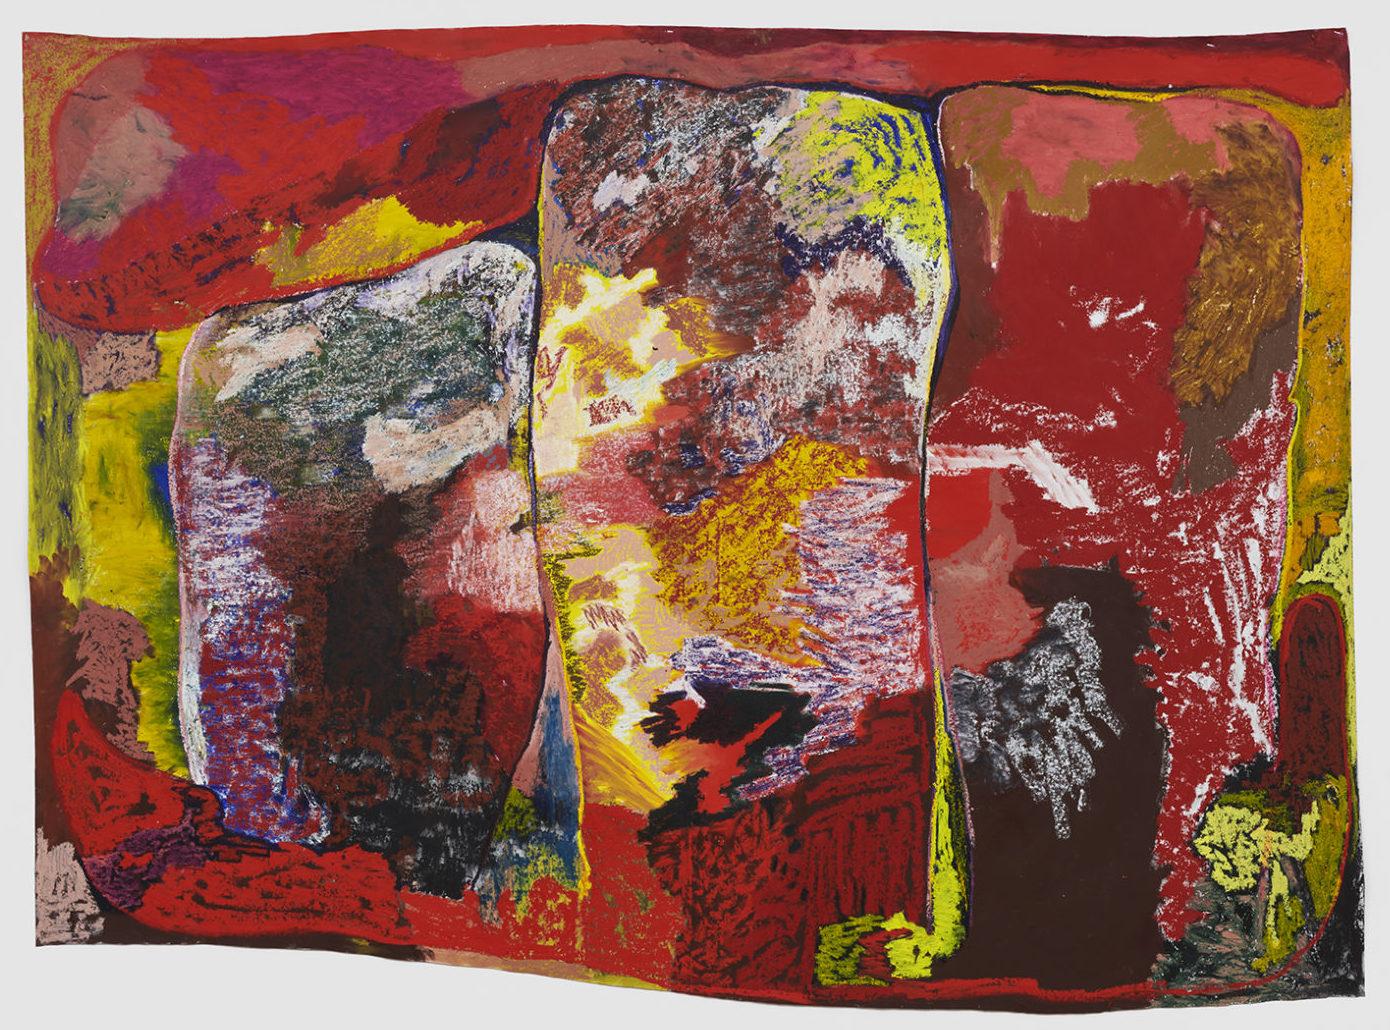 Rachel Jones, courtesy the artist